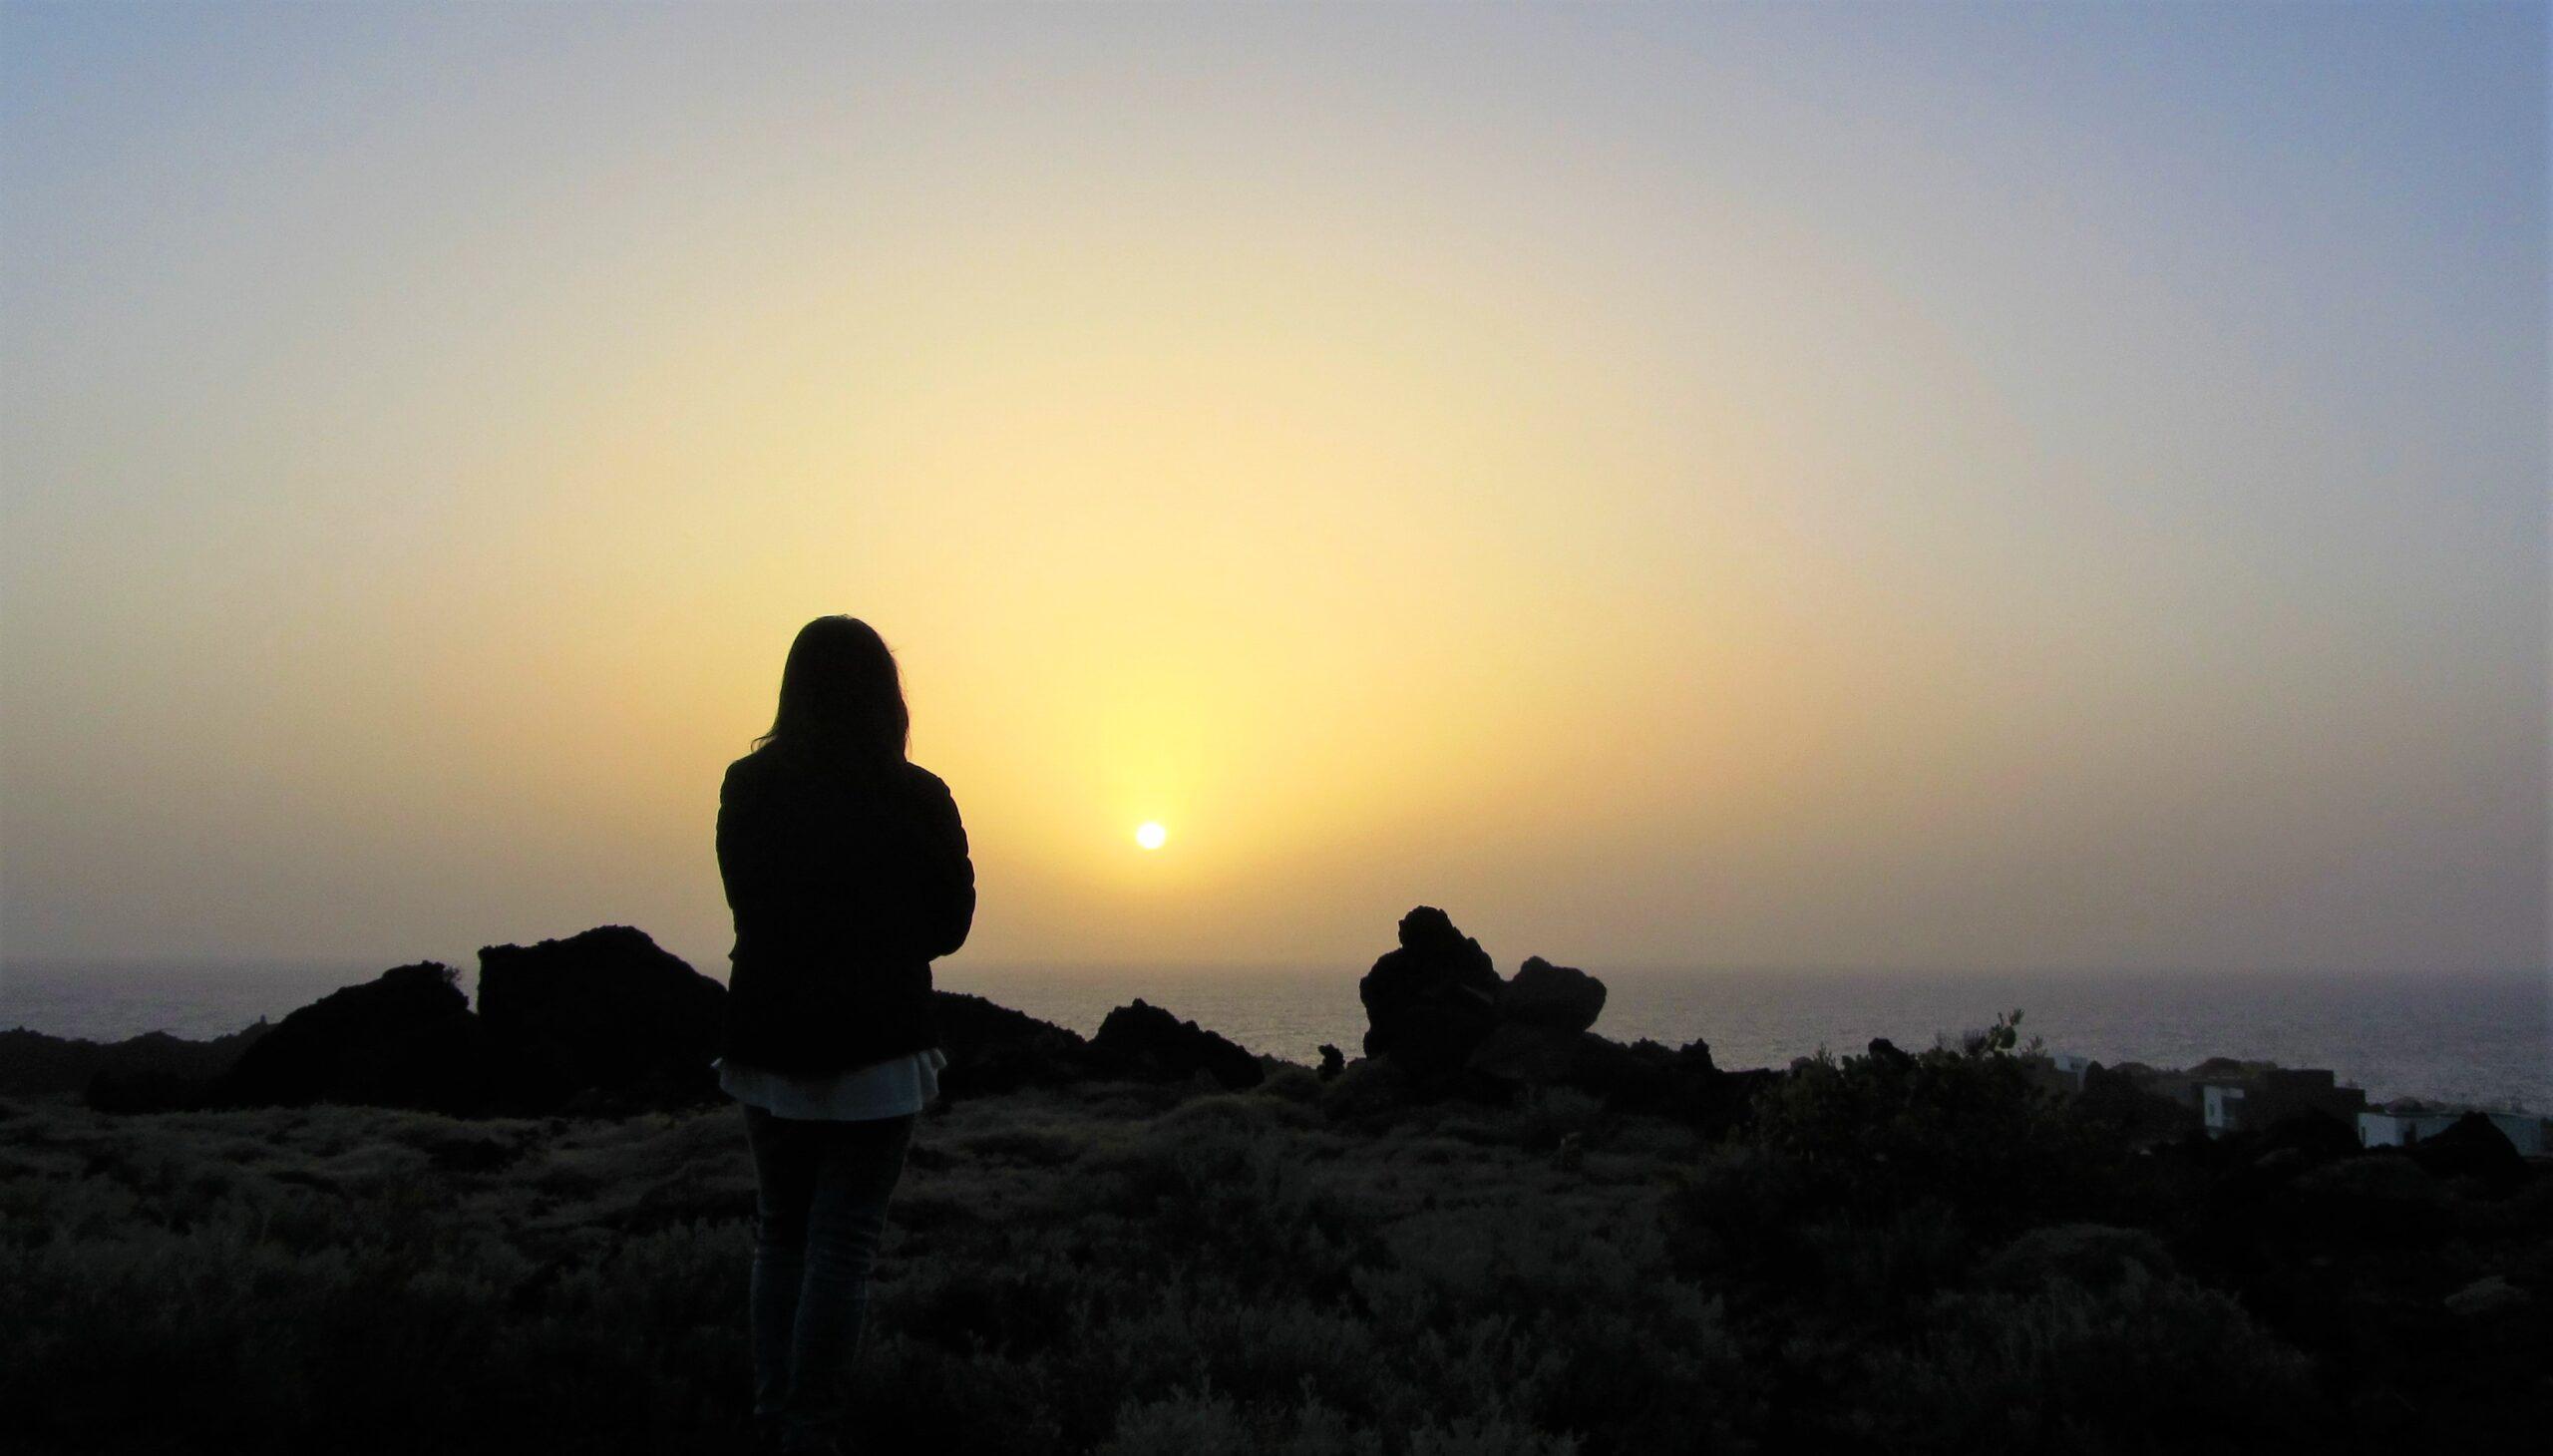 Watching the sunrise in Tamaduste